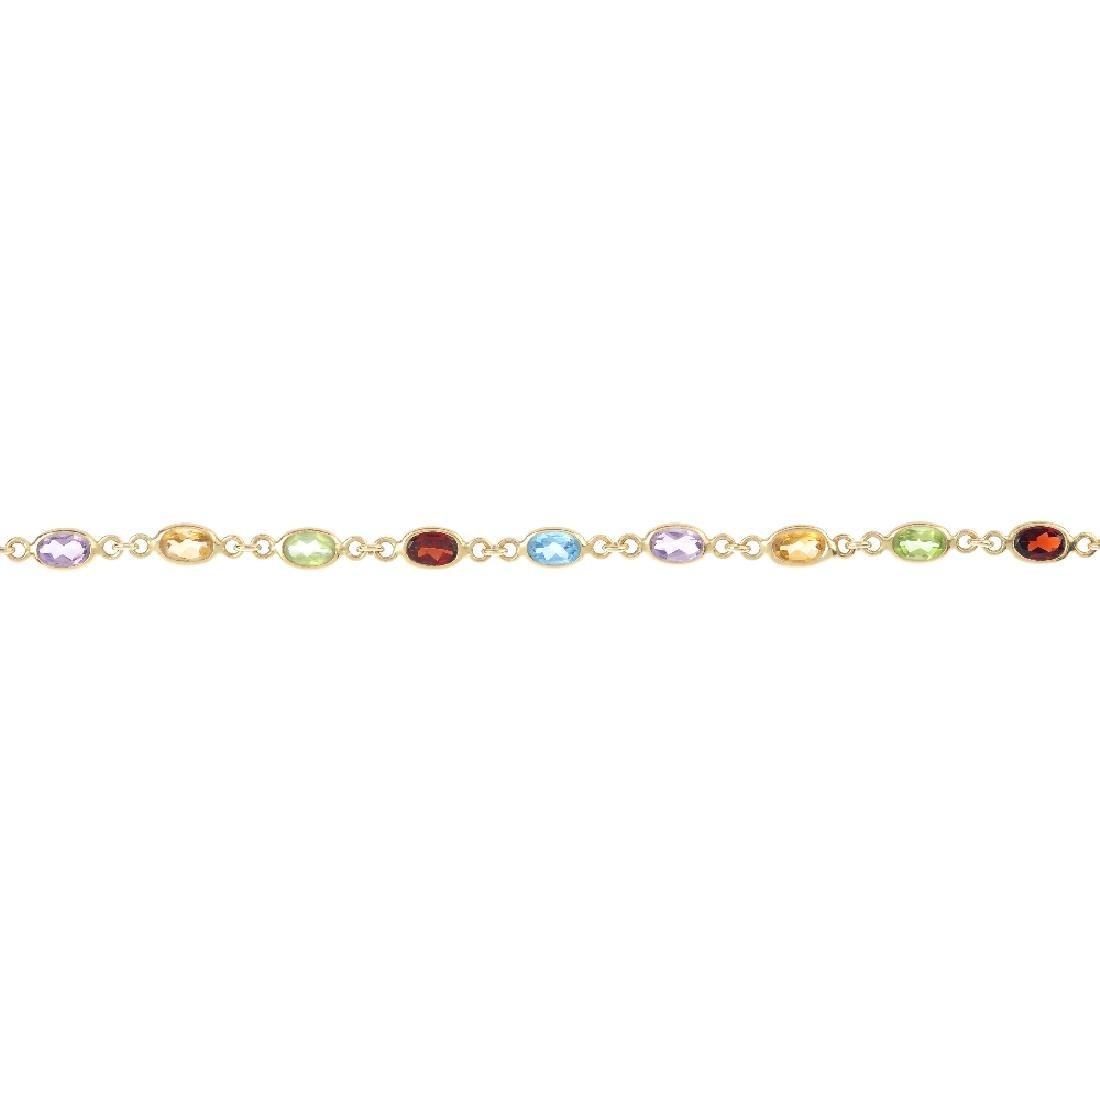 A bracelet and pair of earrings. The bracelet designed